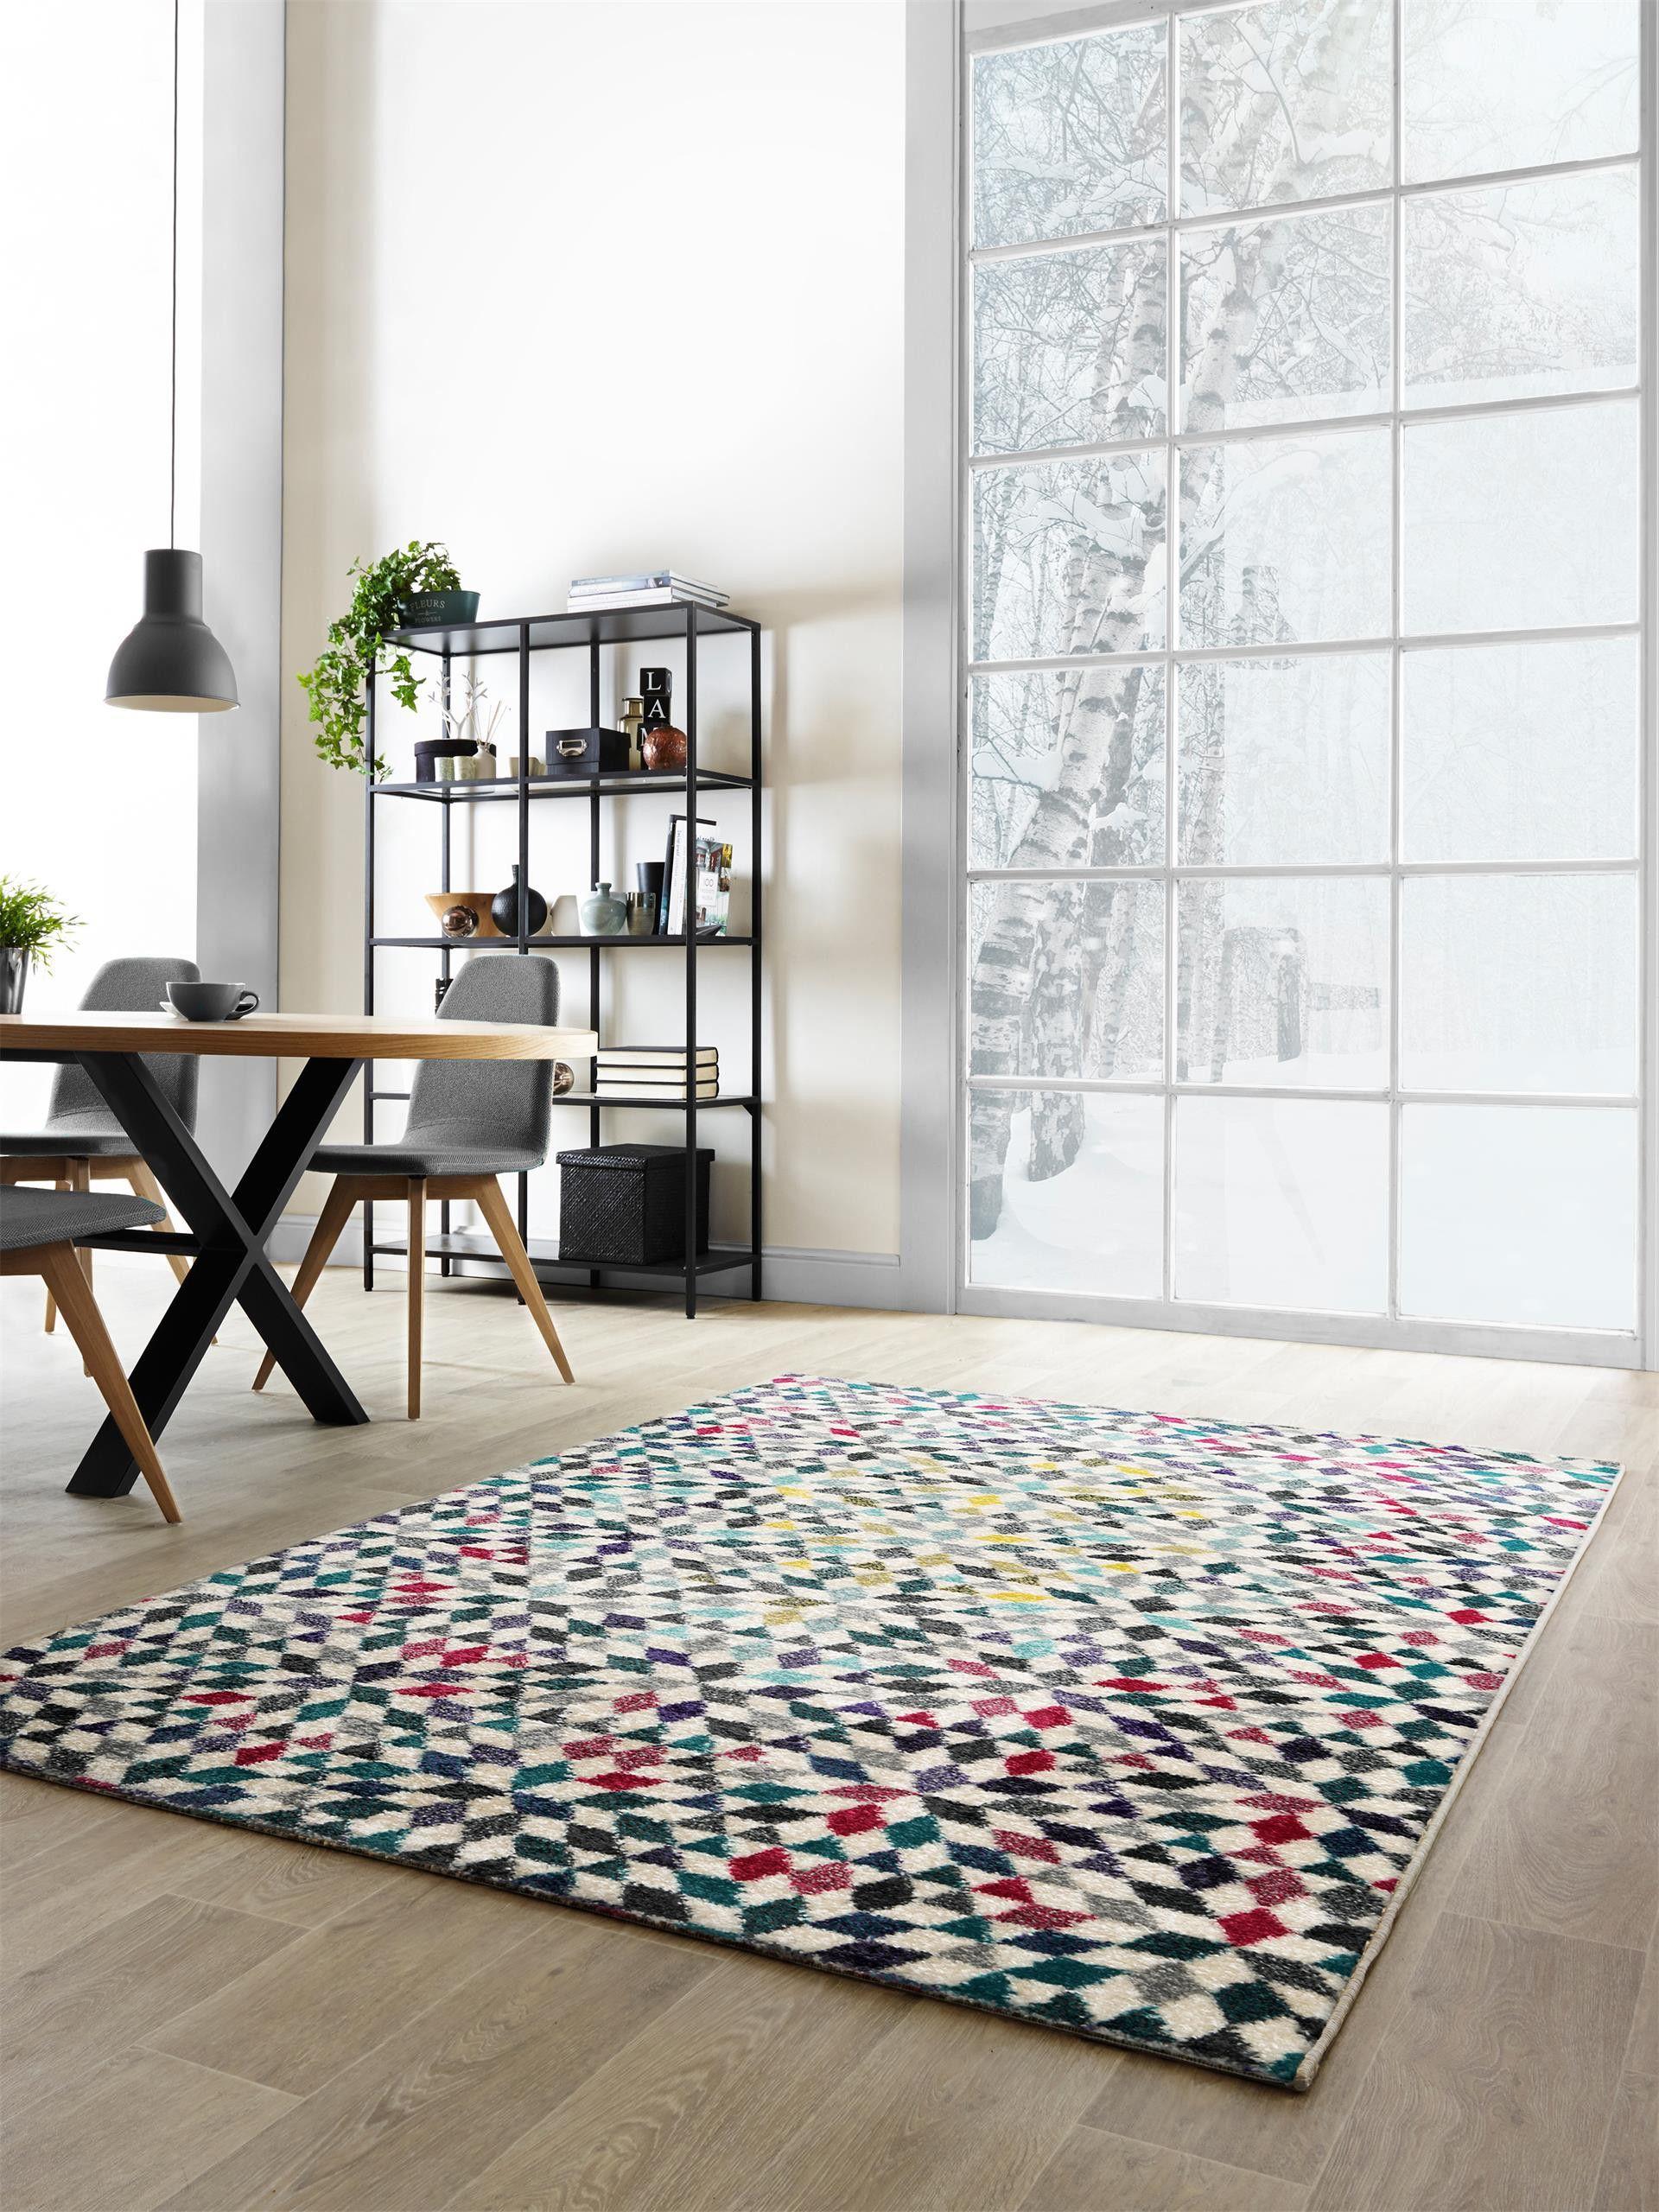 Benuta Teppich teppich arte illusion benuta teppich ethno interior rug ethno